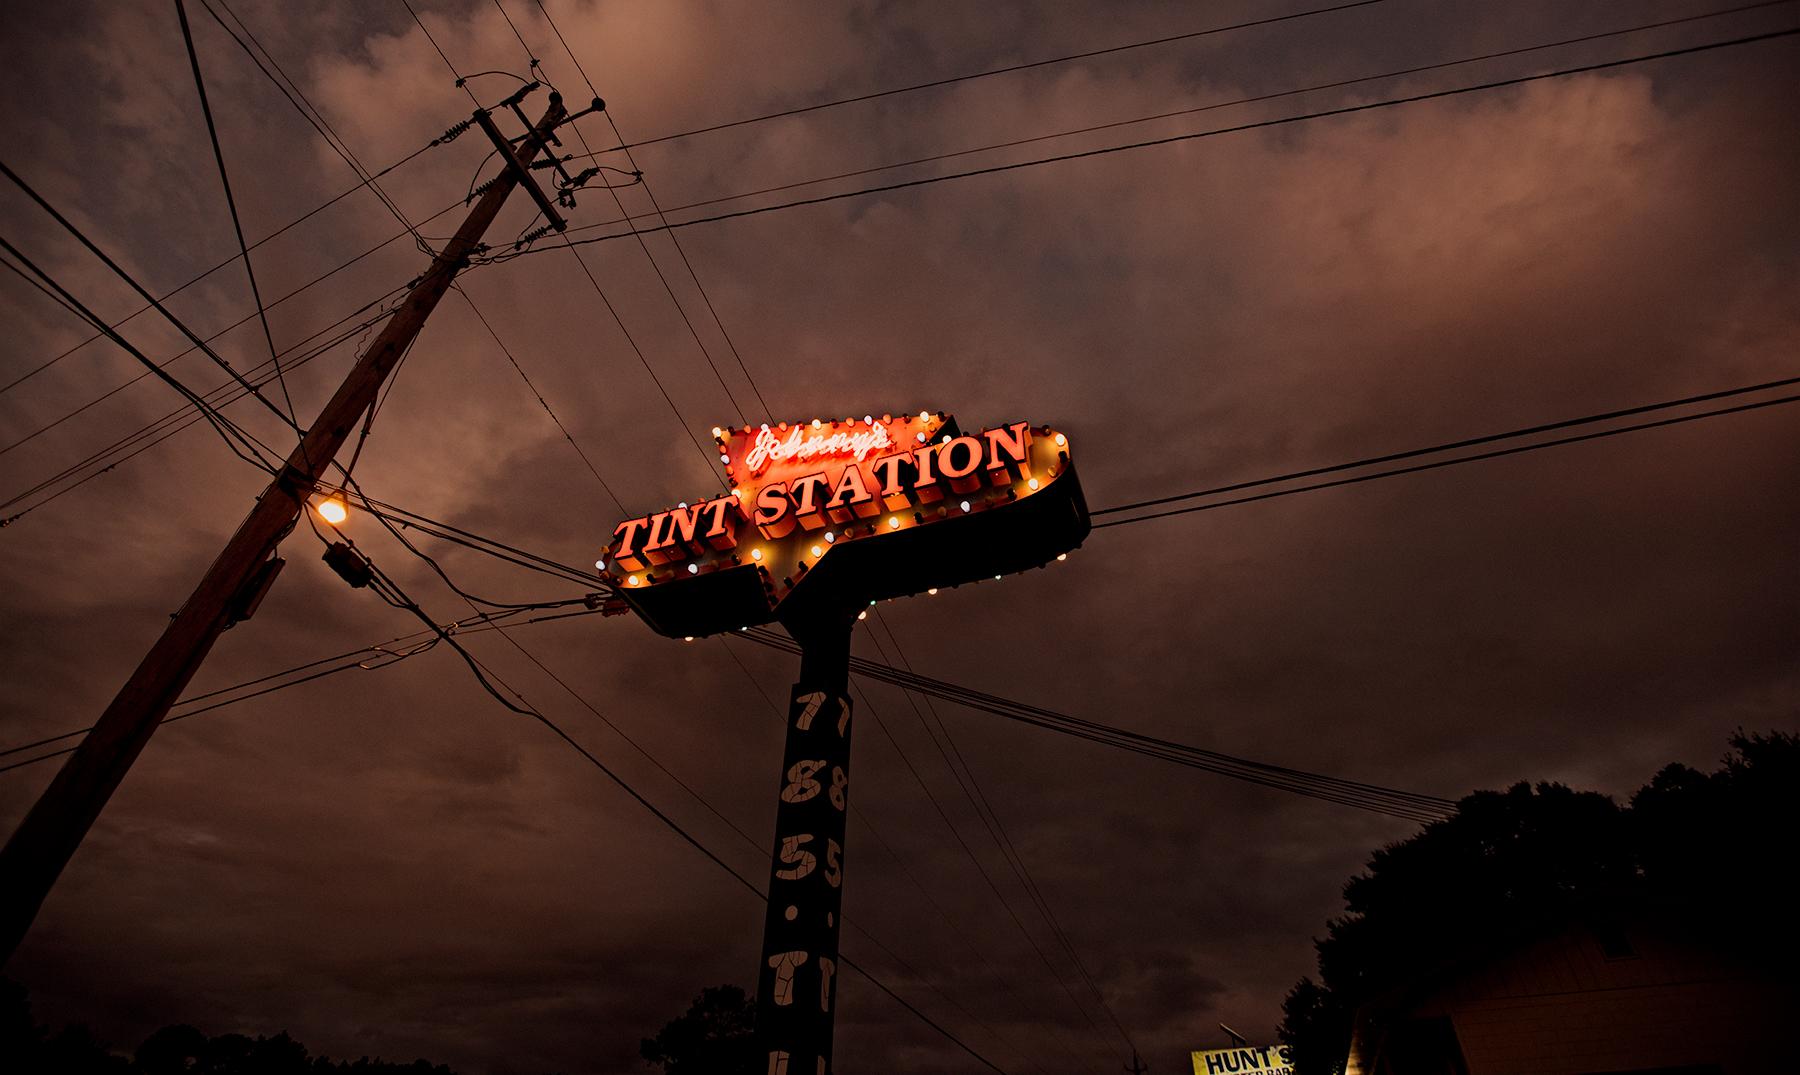 Johnny's Tint Station, Pascagoula, Miss